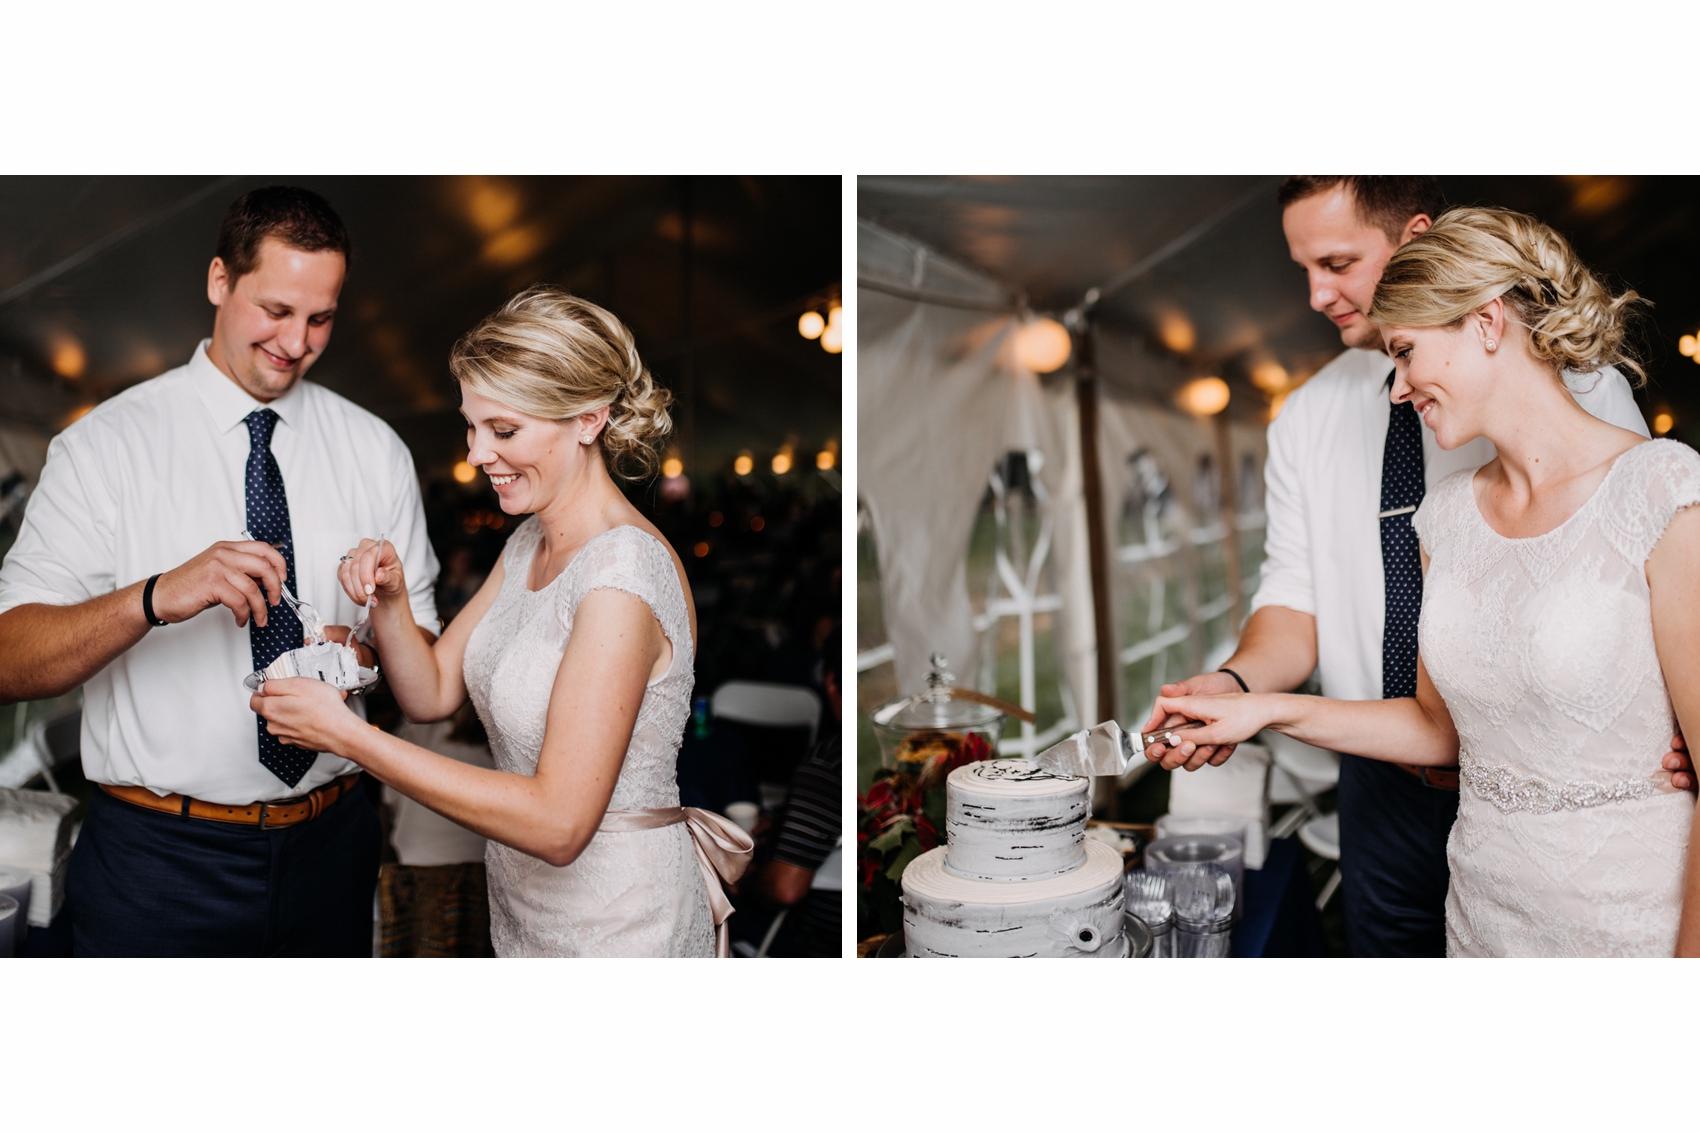 birch-tree-wedding-cake-bride-groom.jpg